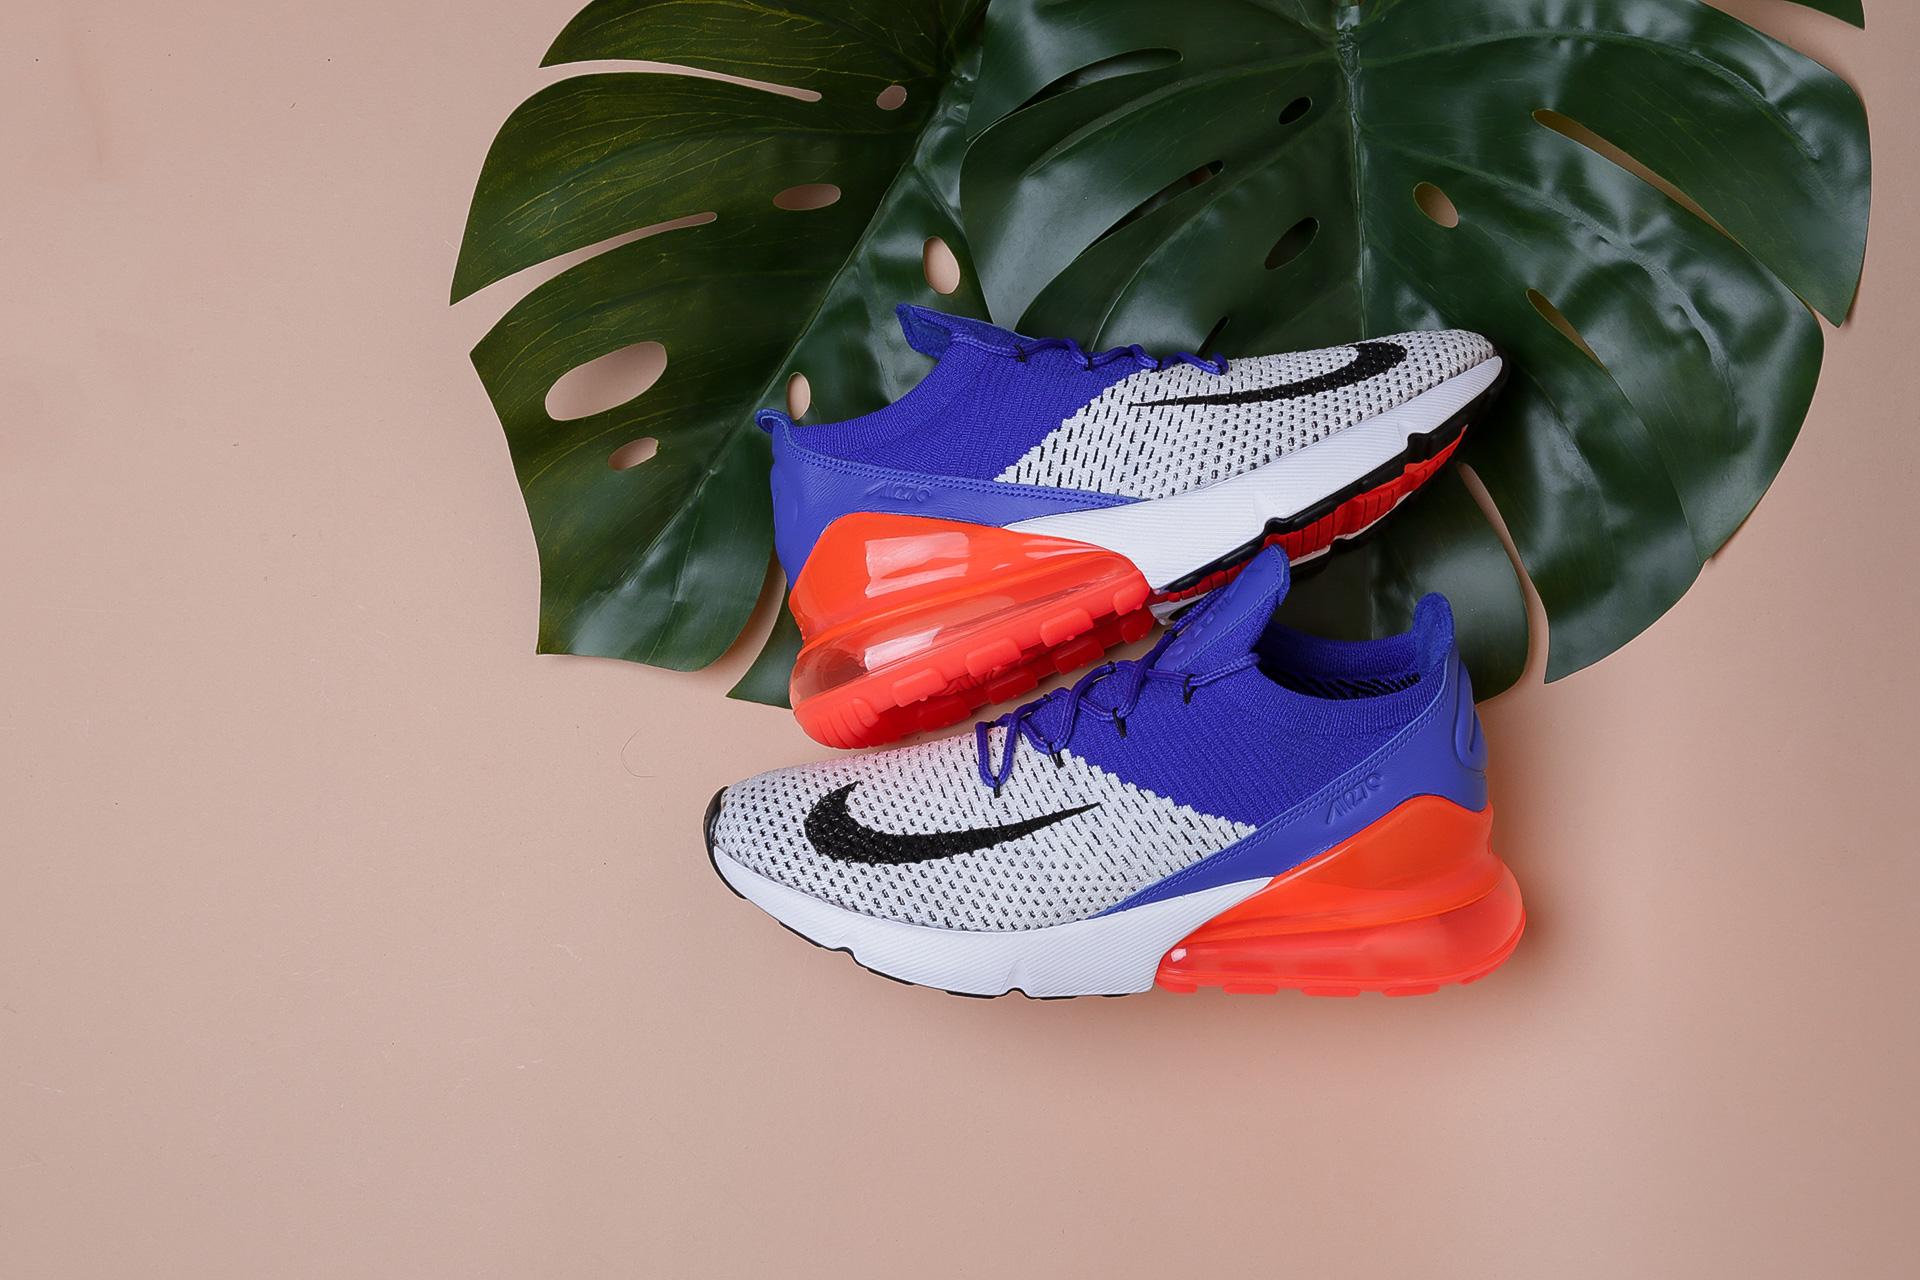 ca4a7cb5 Купить синие мужские кроссовки AIR Max 270 Flyknit от Nike (AO1023 ...